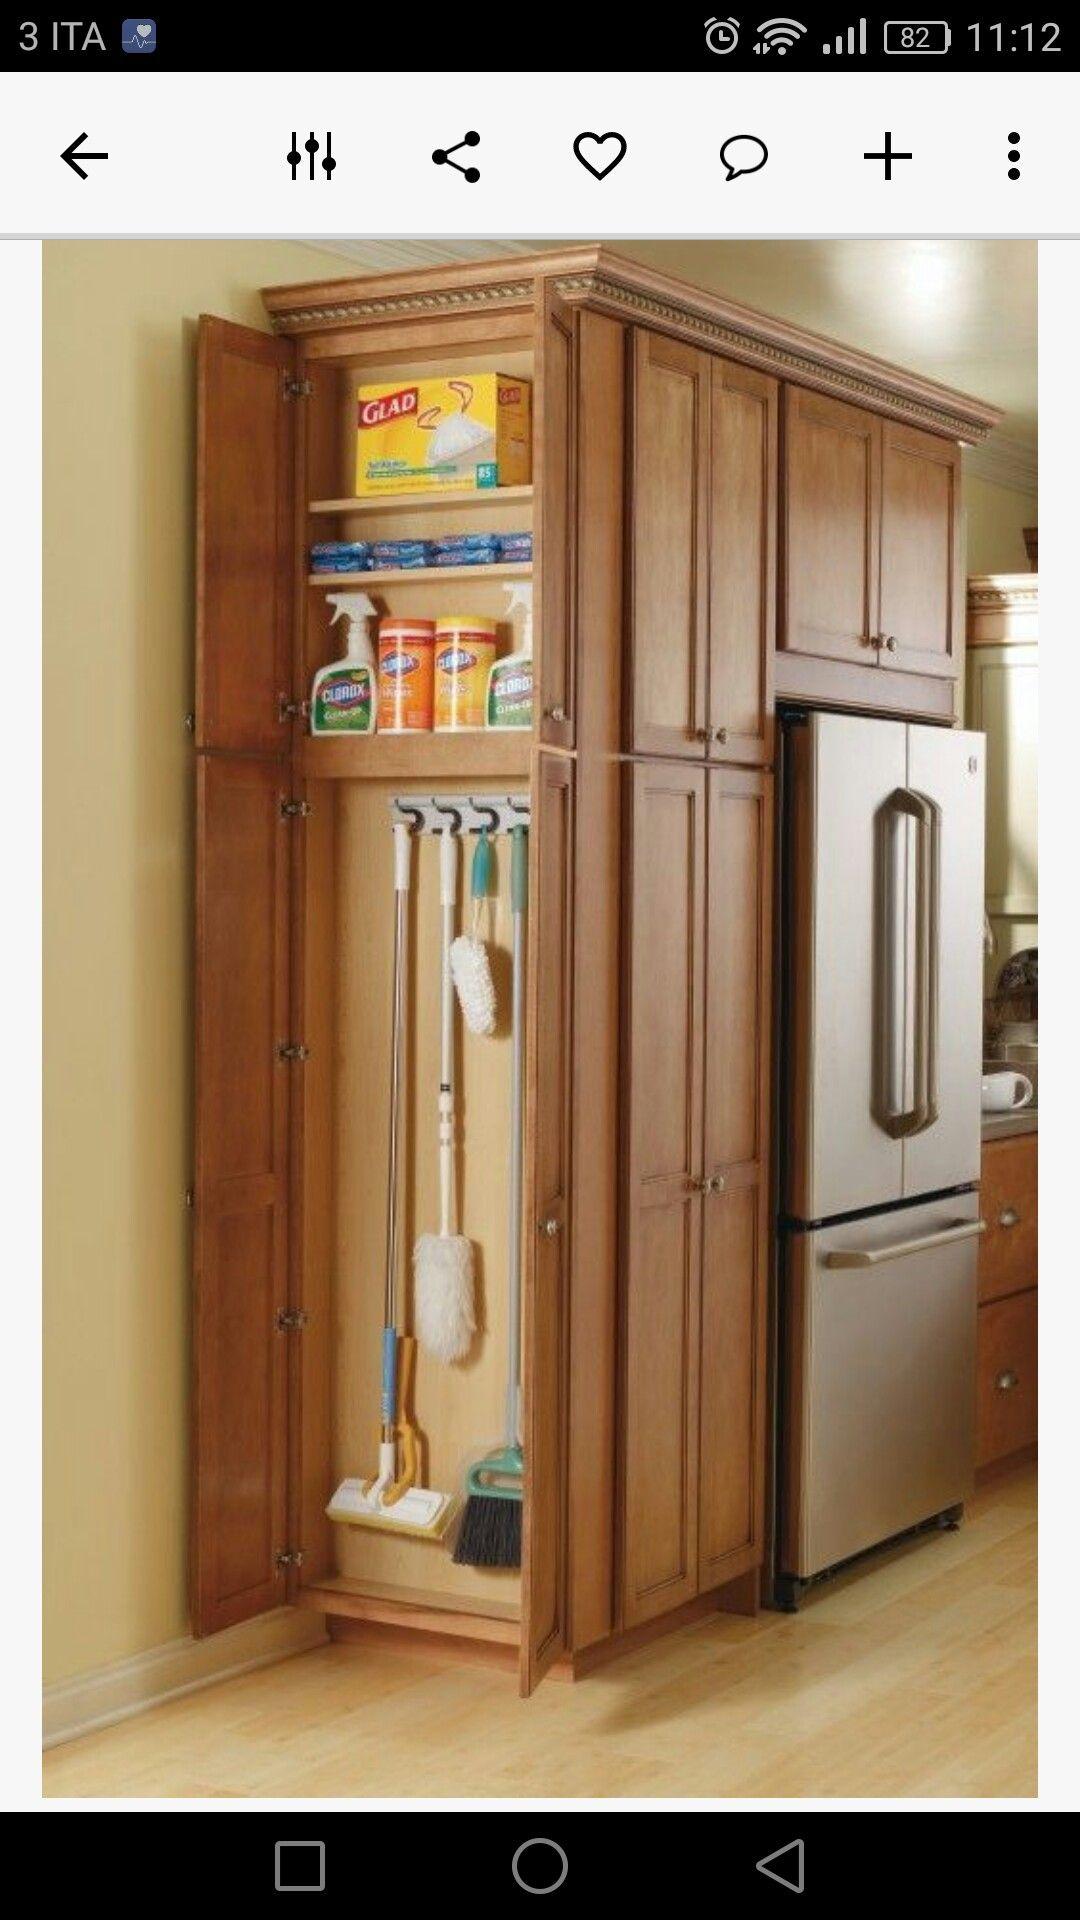 Kitchen storage tipa foto housekeeping stuff